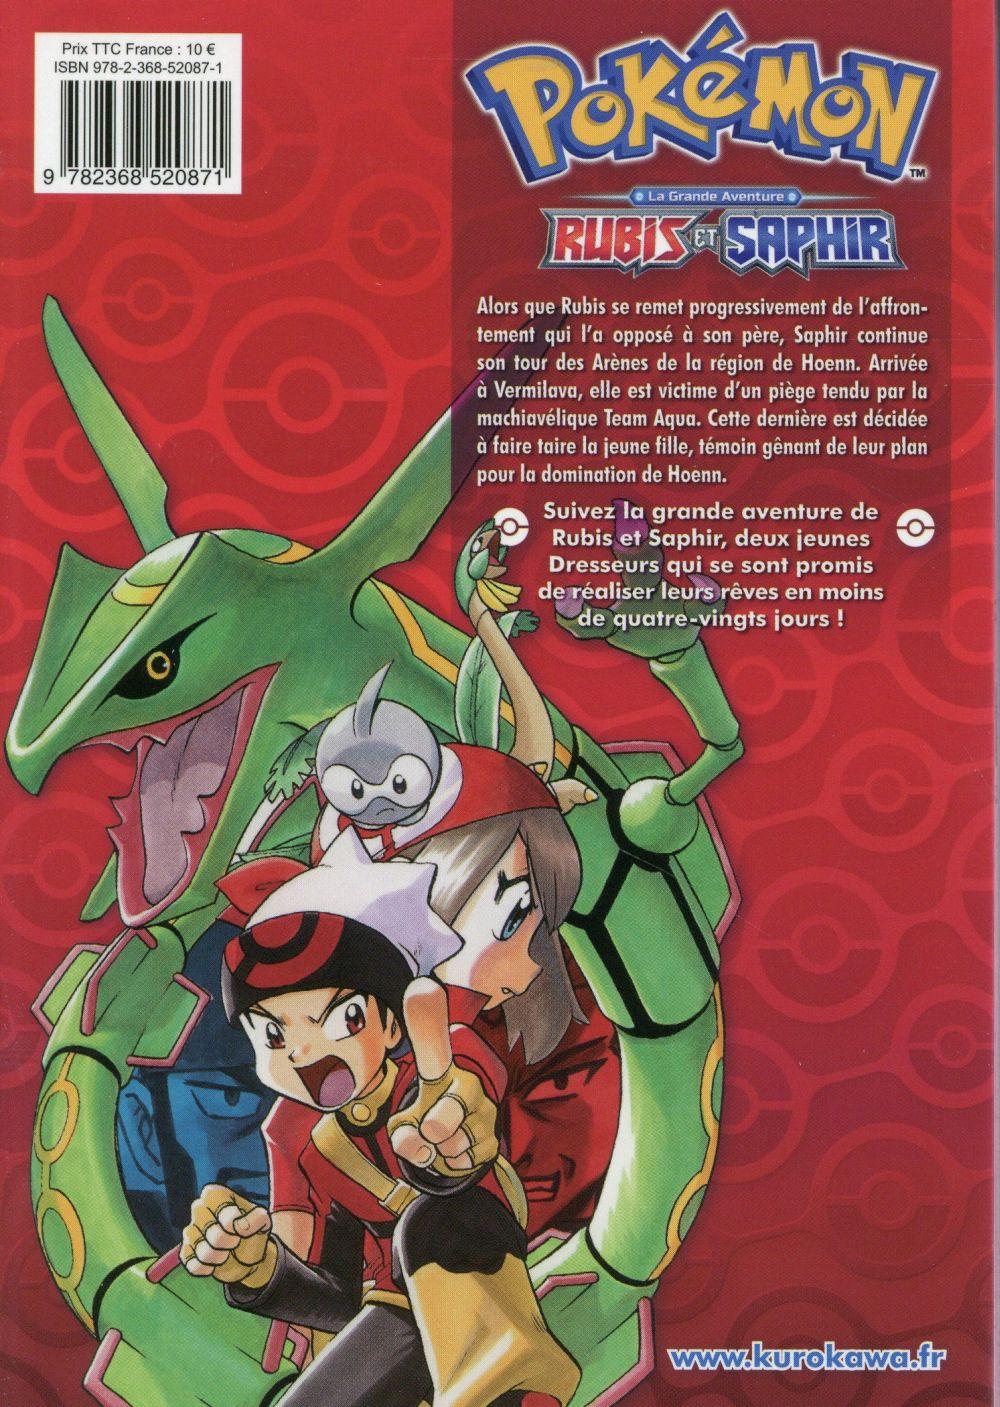 Pokémon ; la grande aventure - Rubis et Saphir t.2